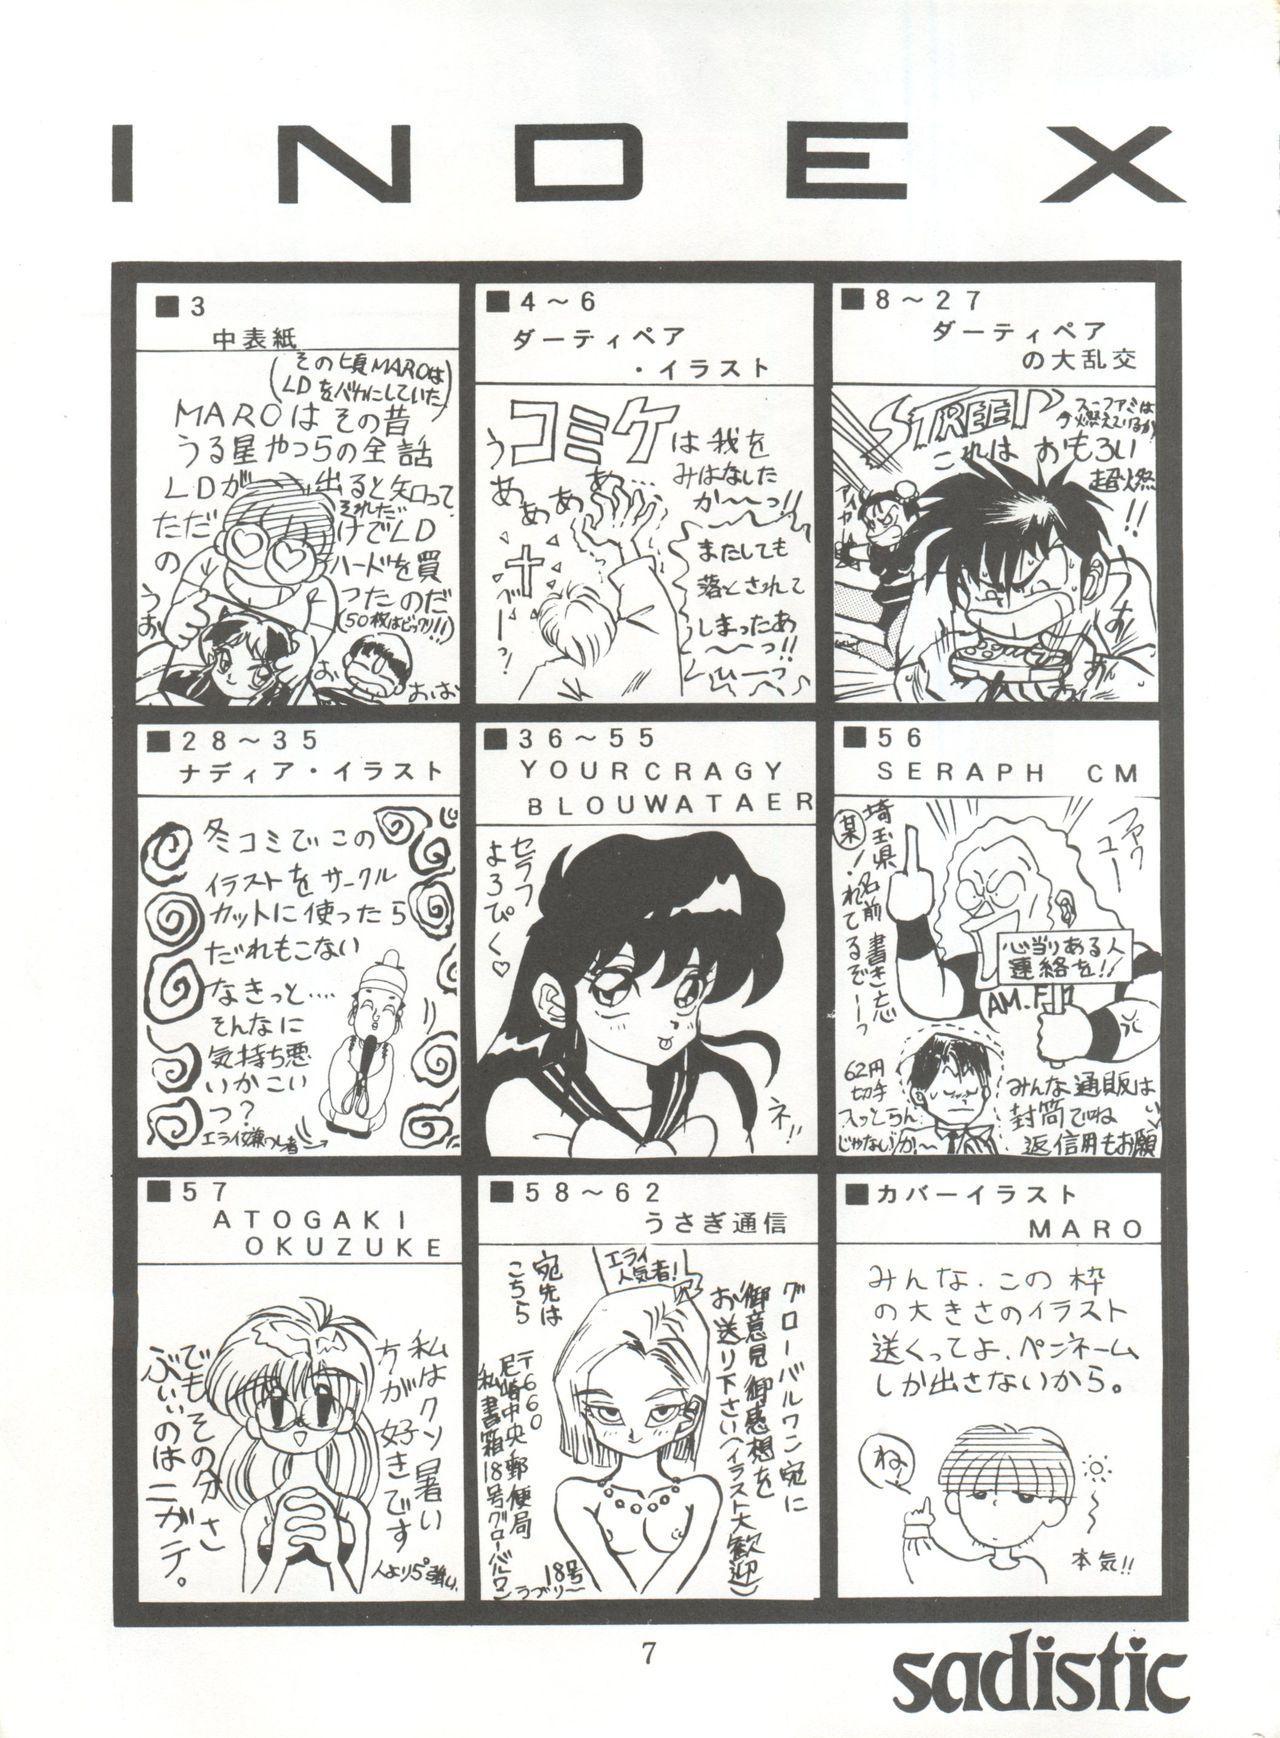 [Global One (MARO)] Sadistic 5 (Cutey Honey, Devilman, Sailor Moon), [Global One (MARO)] Sadistic (Dirty Pair, Fushigi no Umi no Nadia, Sailor Moon), [Studio Ikkatsumajin] .ribbon (Hime-chan's Ribbon) 66